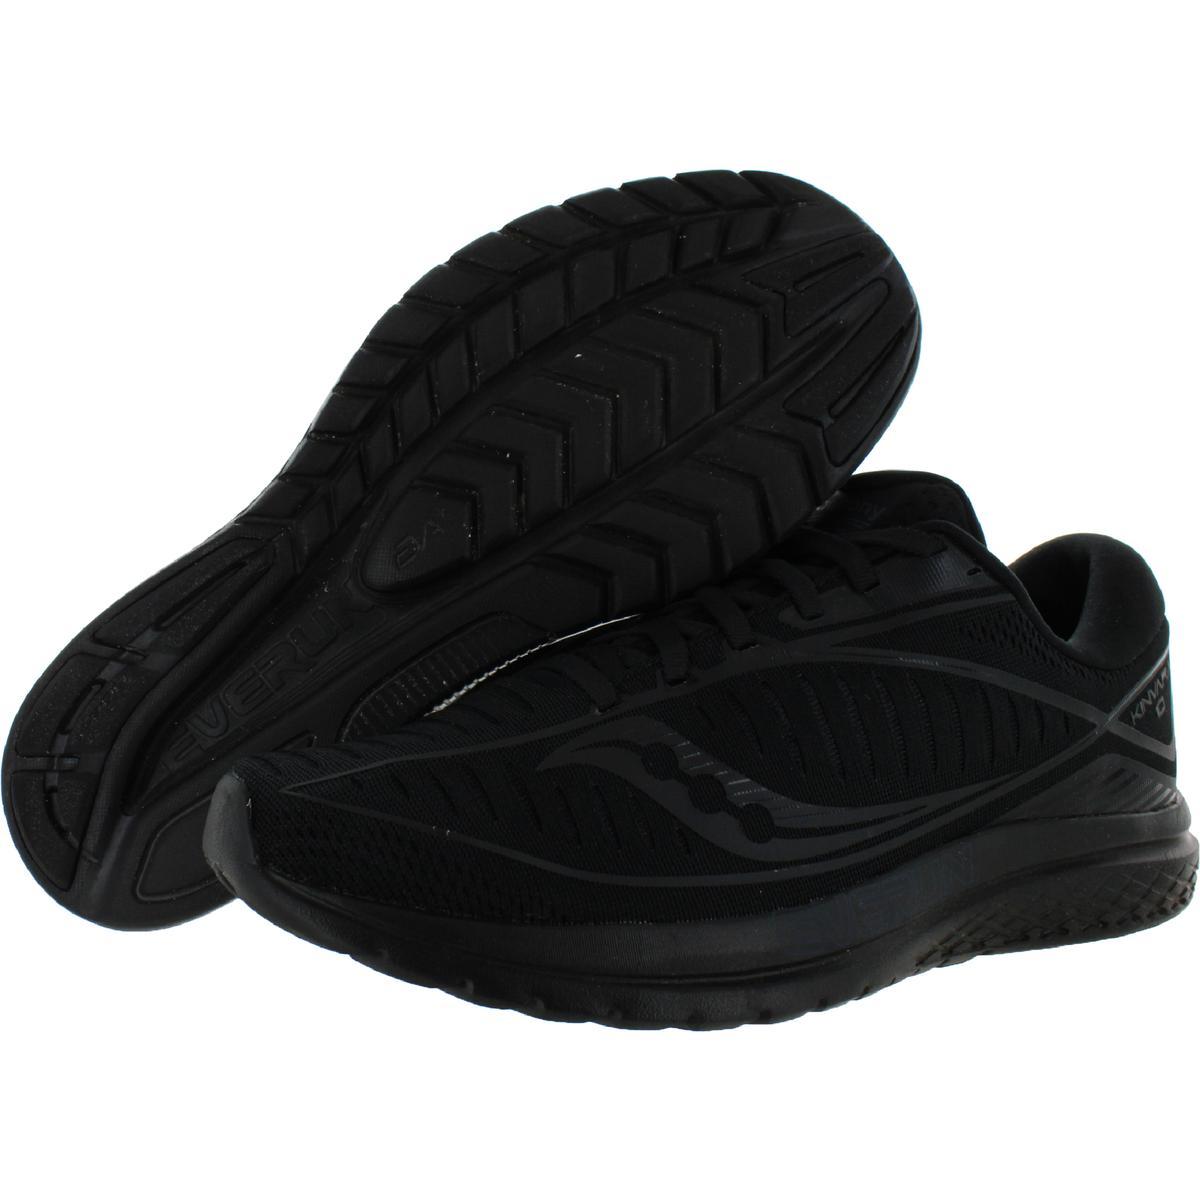 Saucony-Herren-Kinvara-10-Comfort-Running-Turnschuhe-Sneakers-Schuhe-bhfo-3377 Indexbild 5